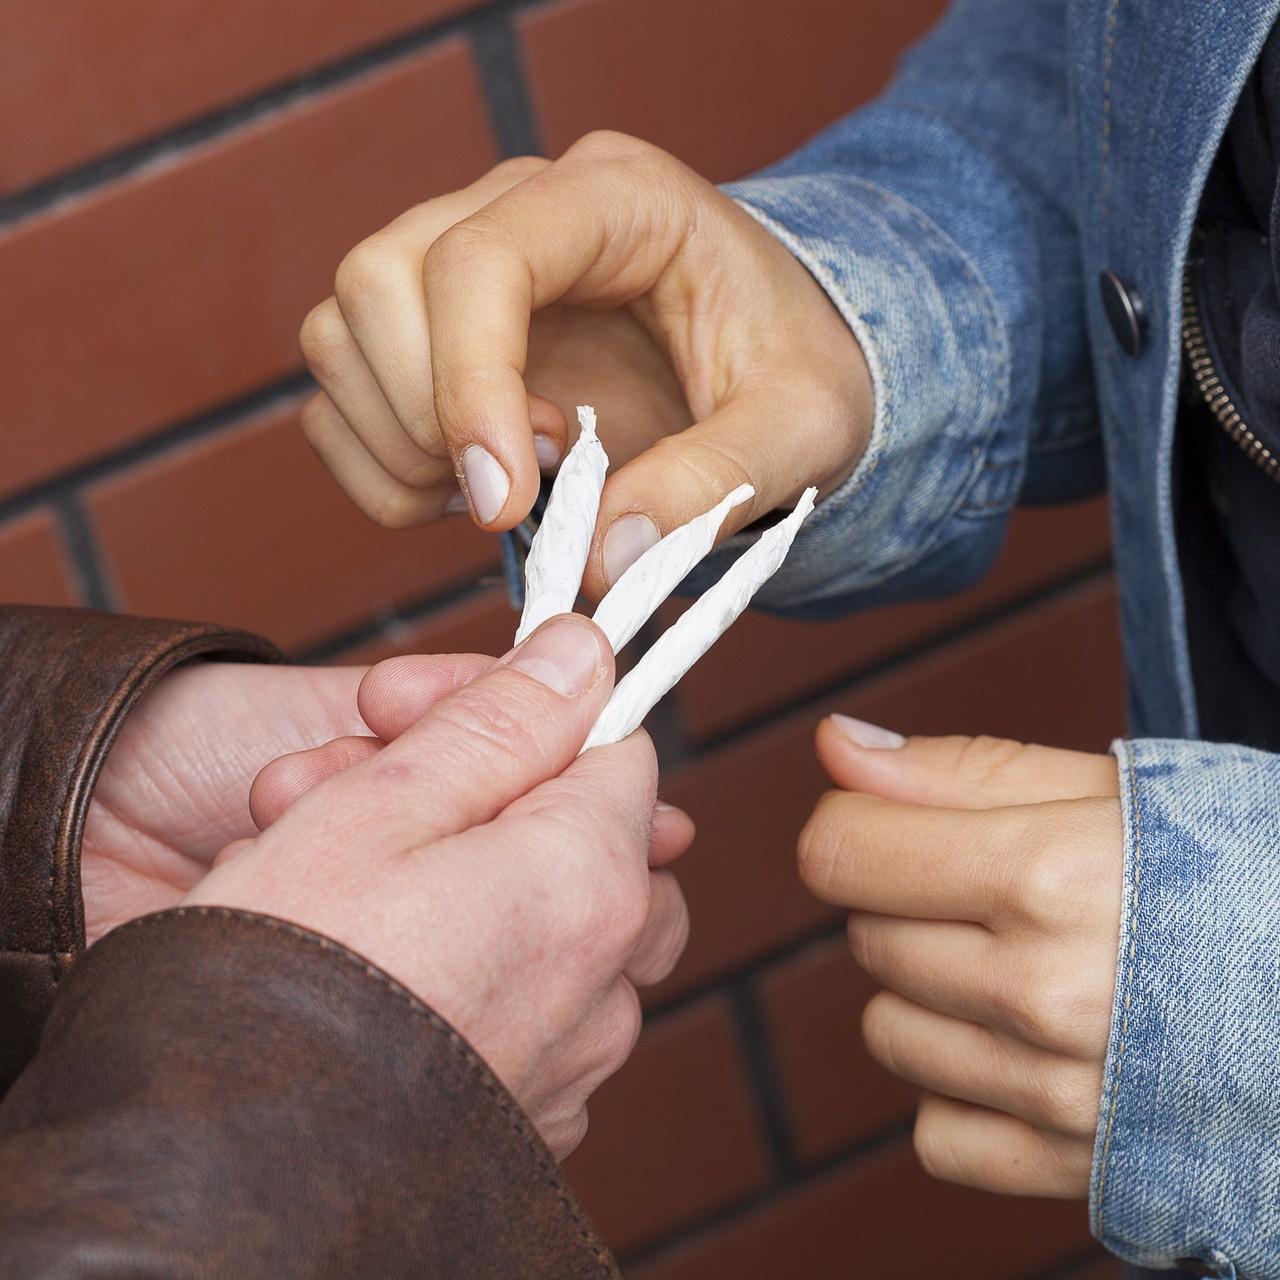 La drogue chez les jeunes